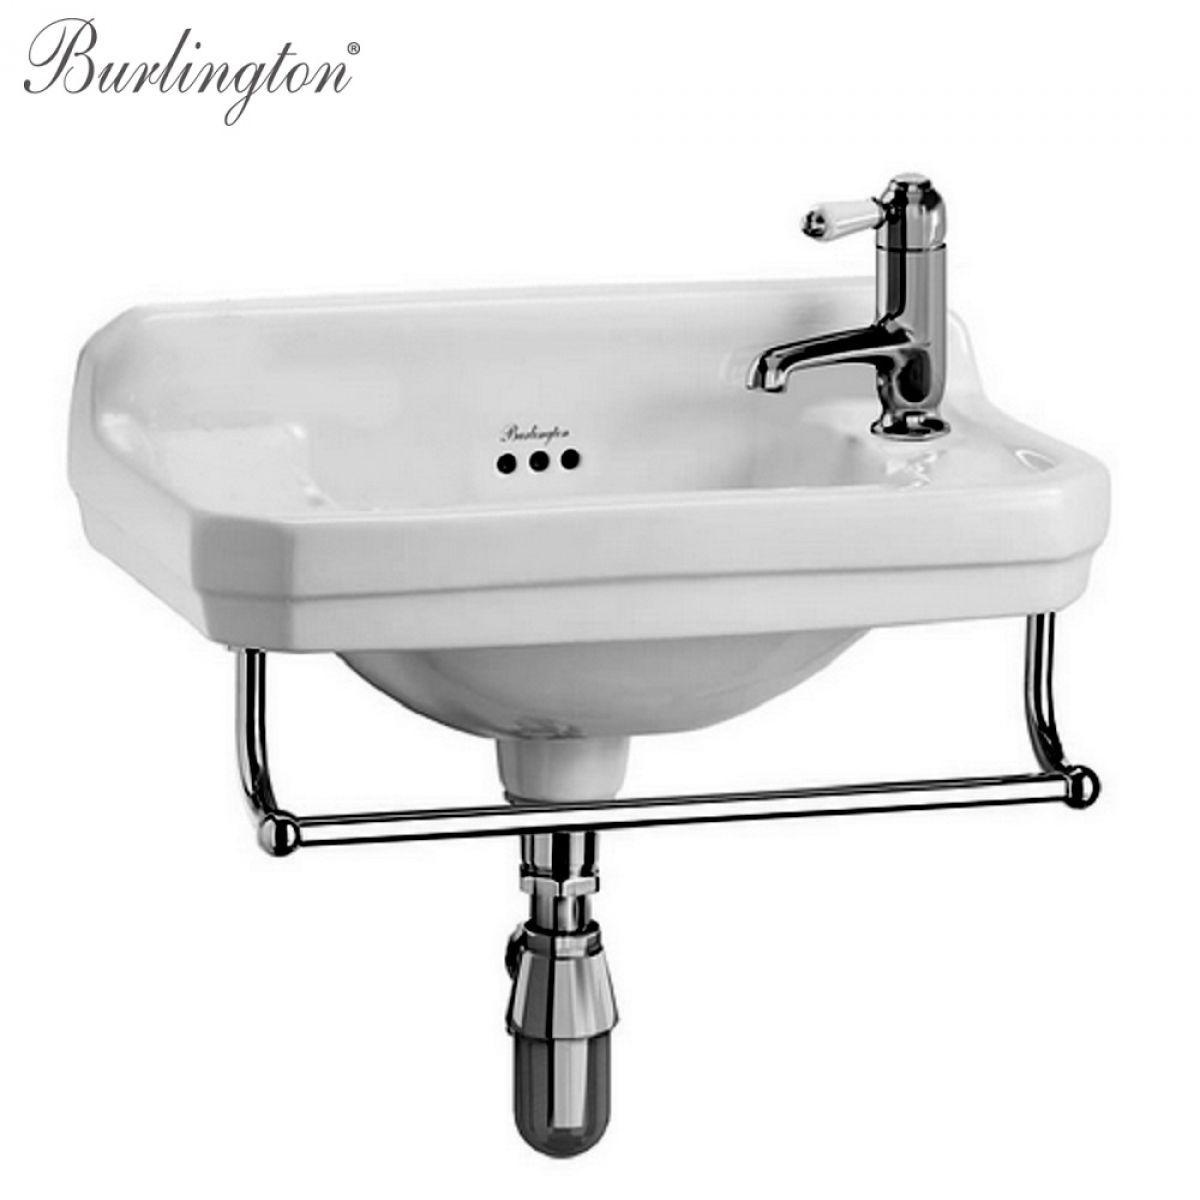 Burlington Edwardian Cloakroom Basin | Cloakroom basin, Basin and Sinks